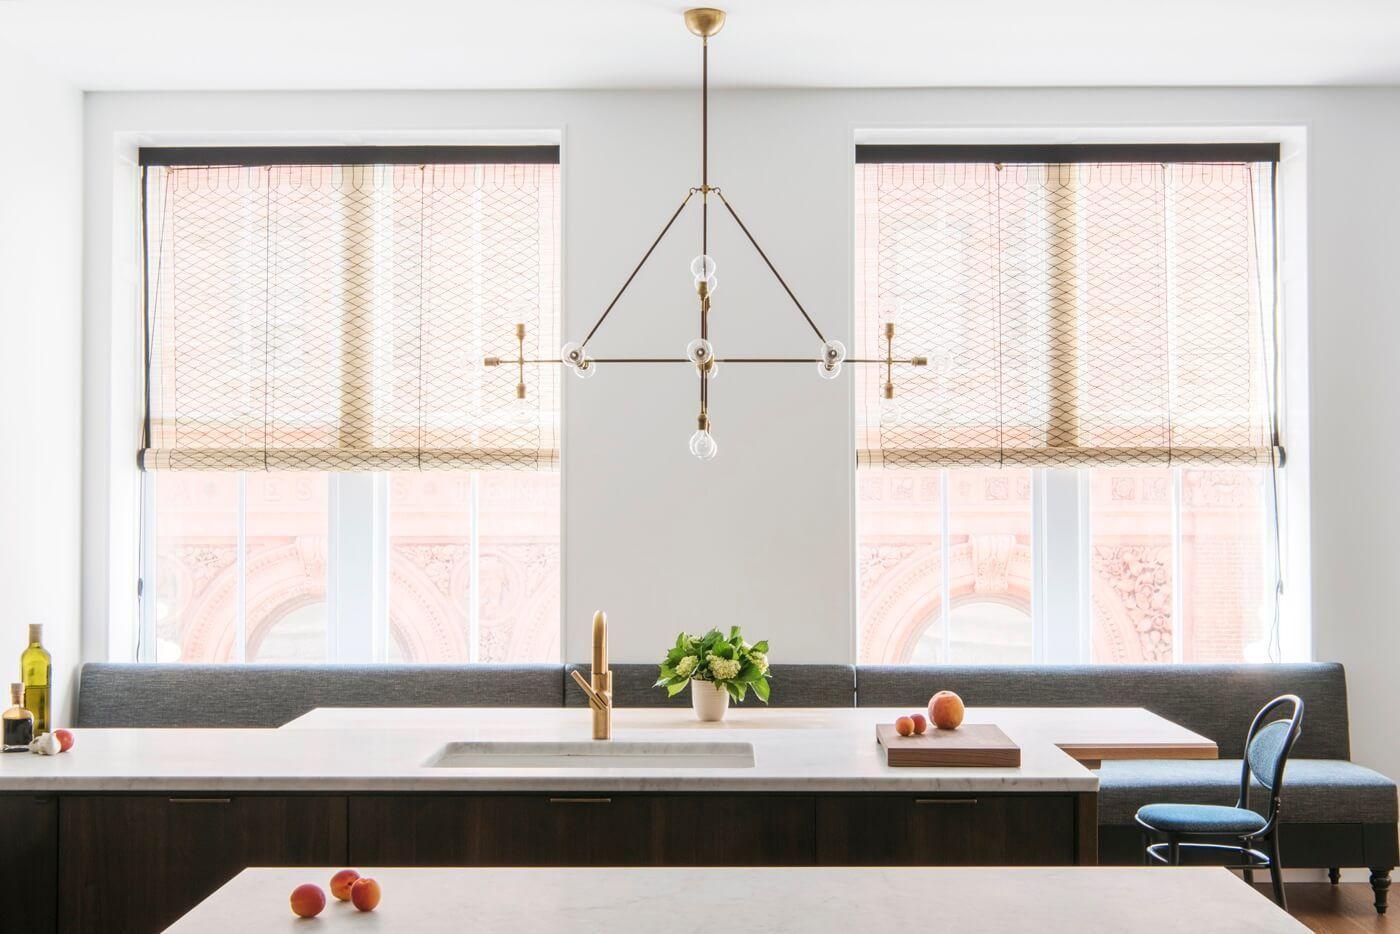 interior design ideas brooklyn heights condo adds architecture